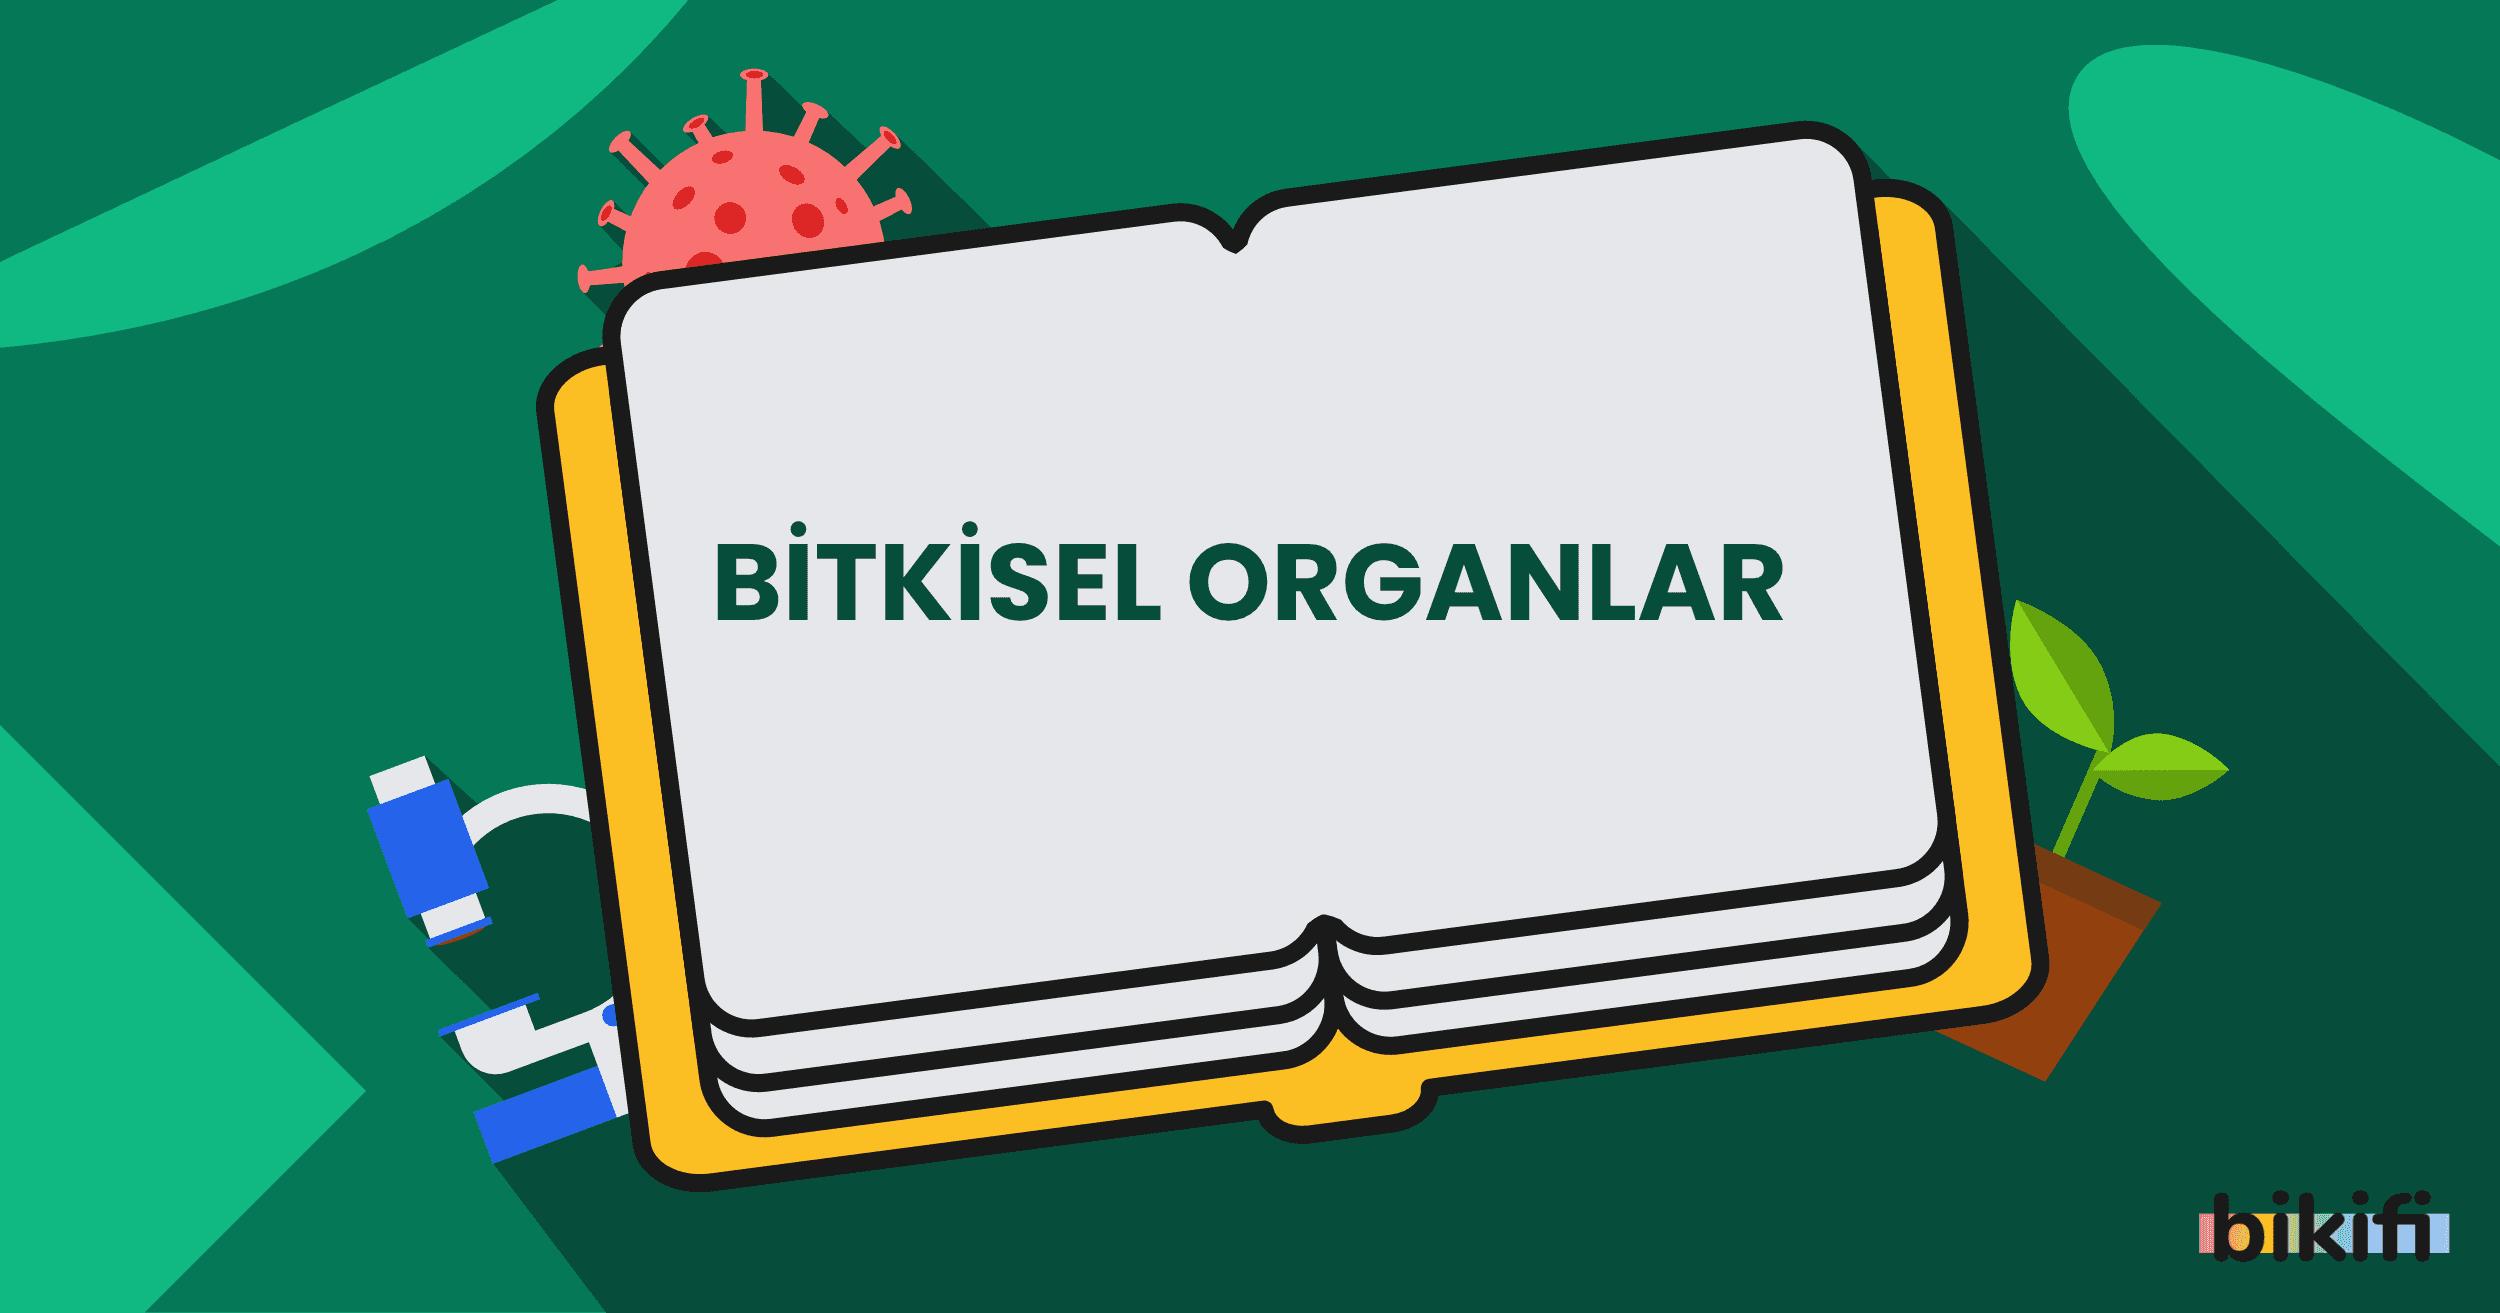 Bitkisel Organlar